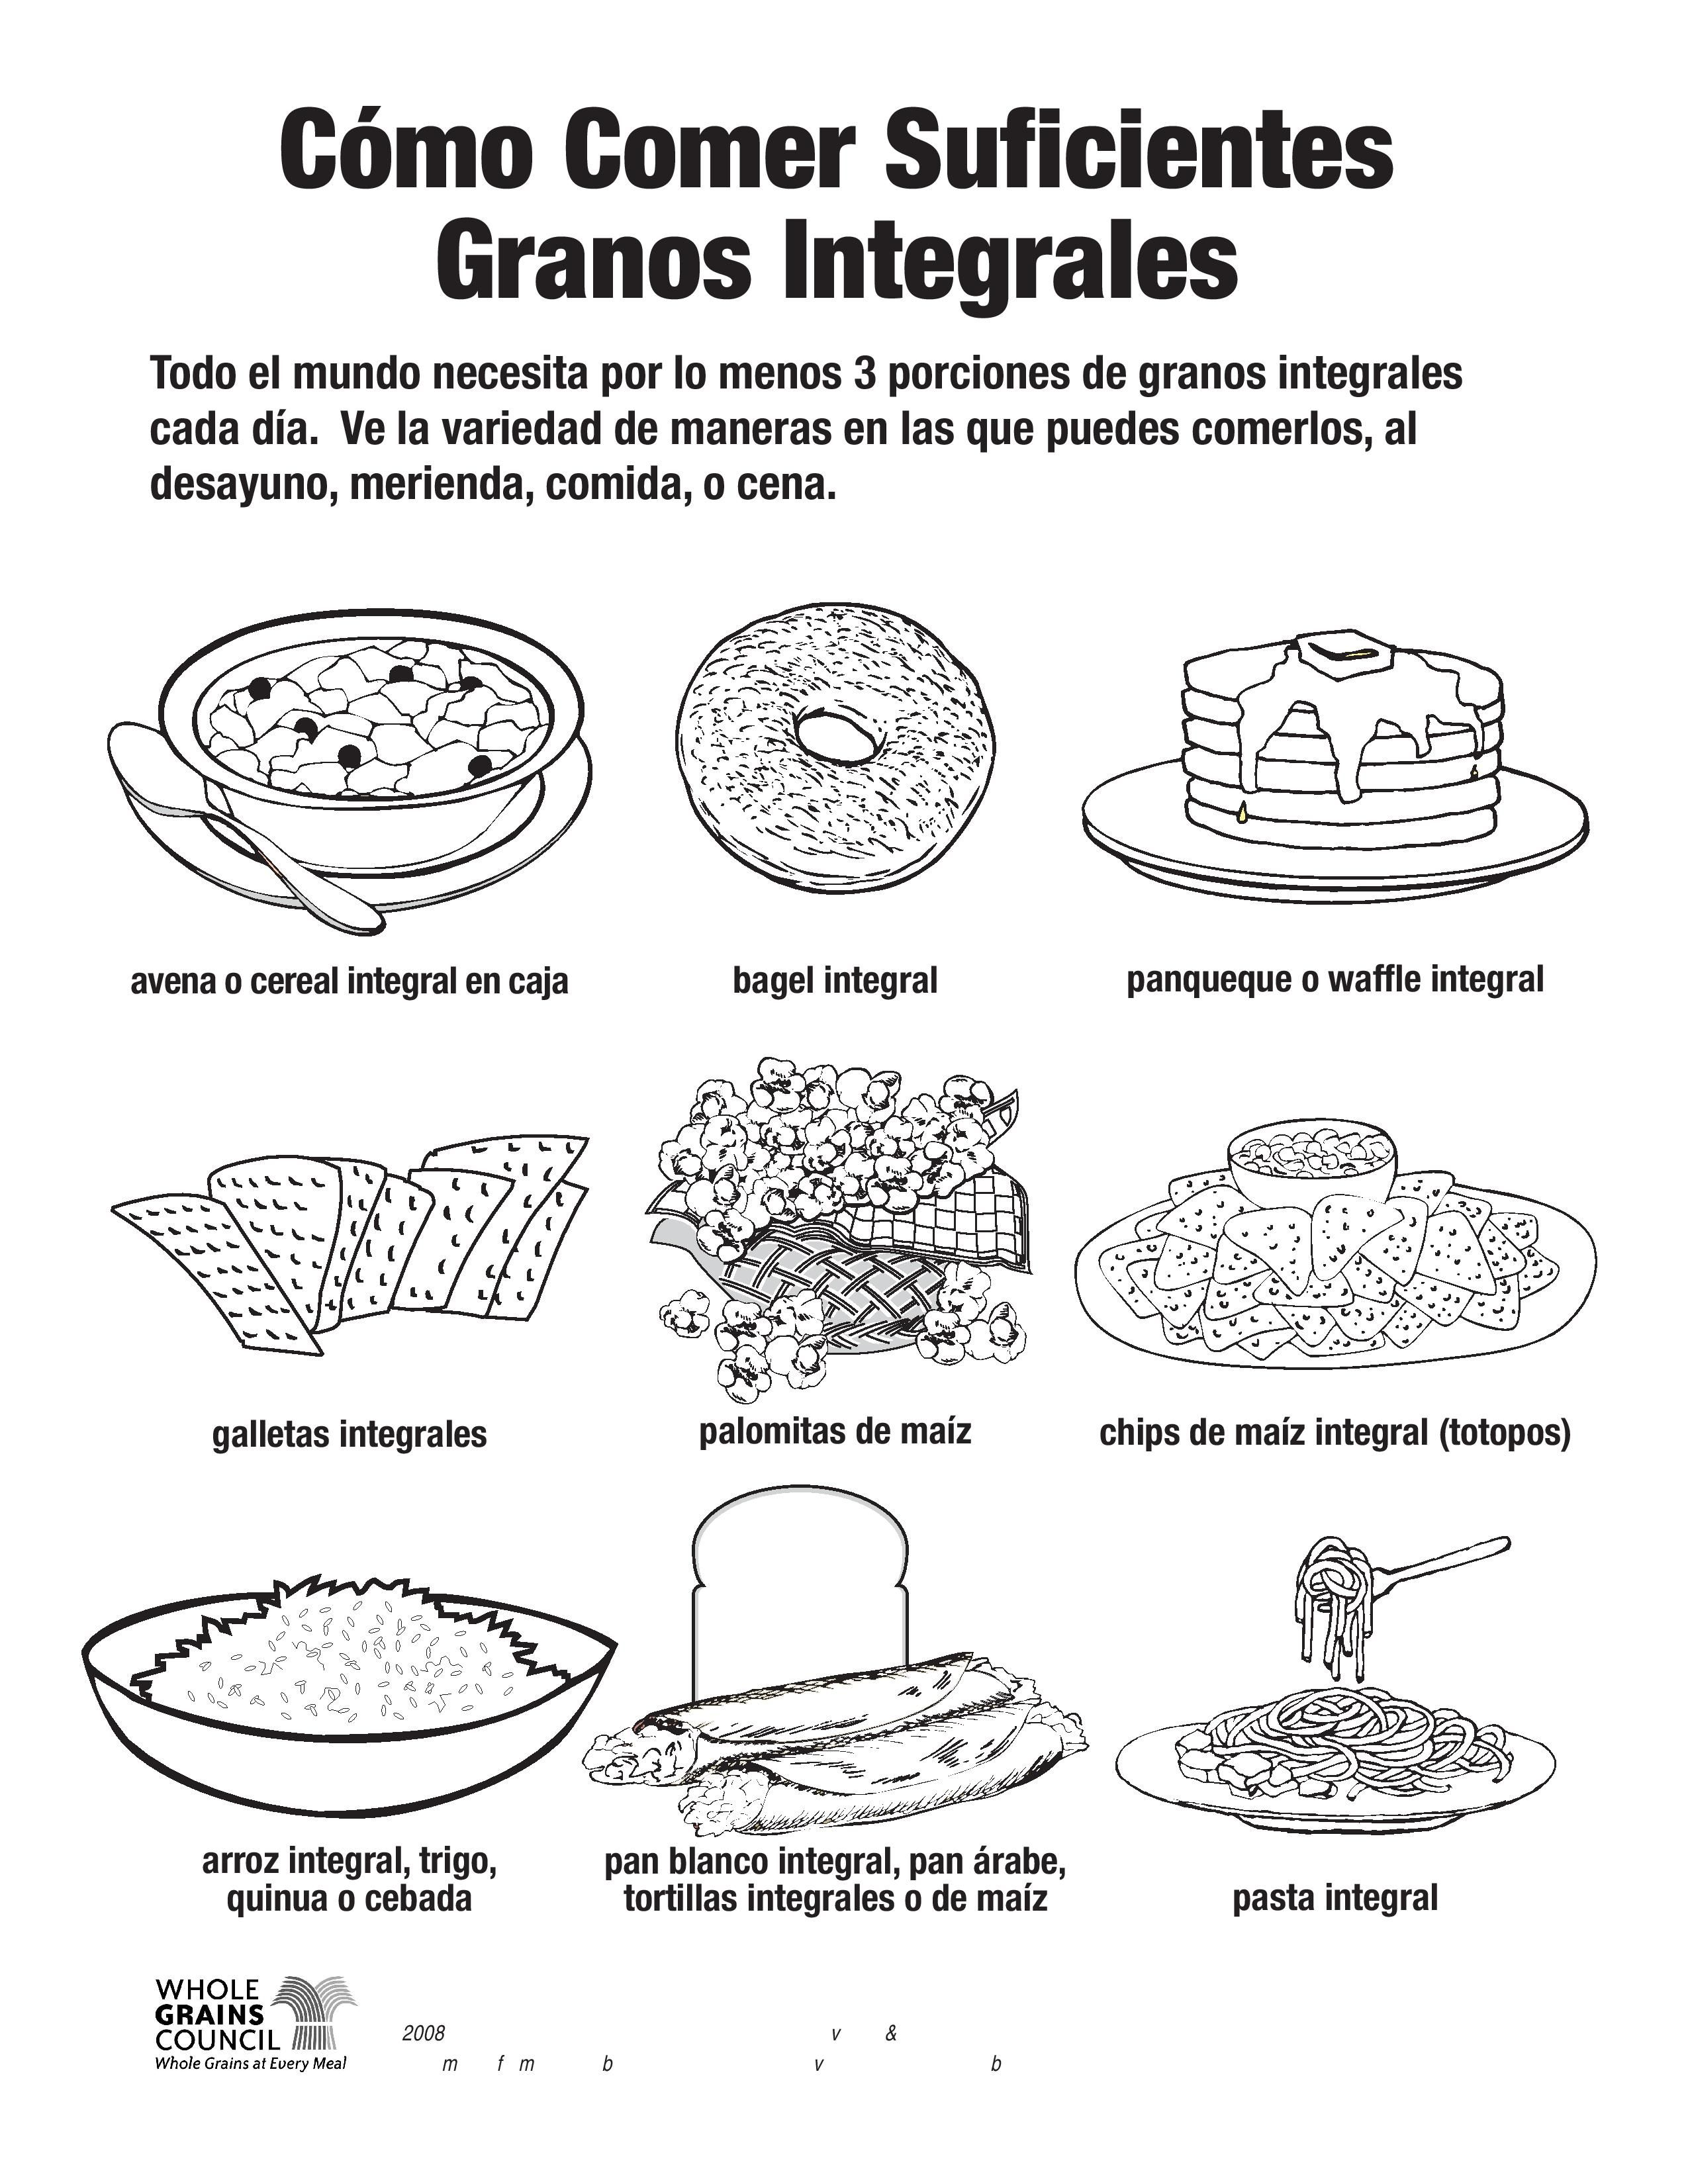 Grains Food Group Worksheet Printable Worksheets And Activities For Teachers Parents Tutors And Homeschool Families